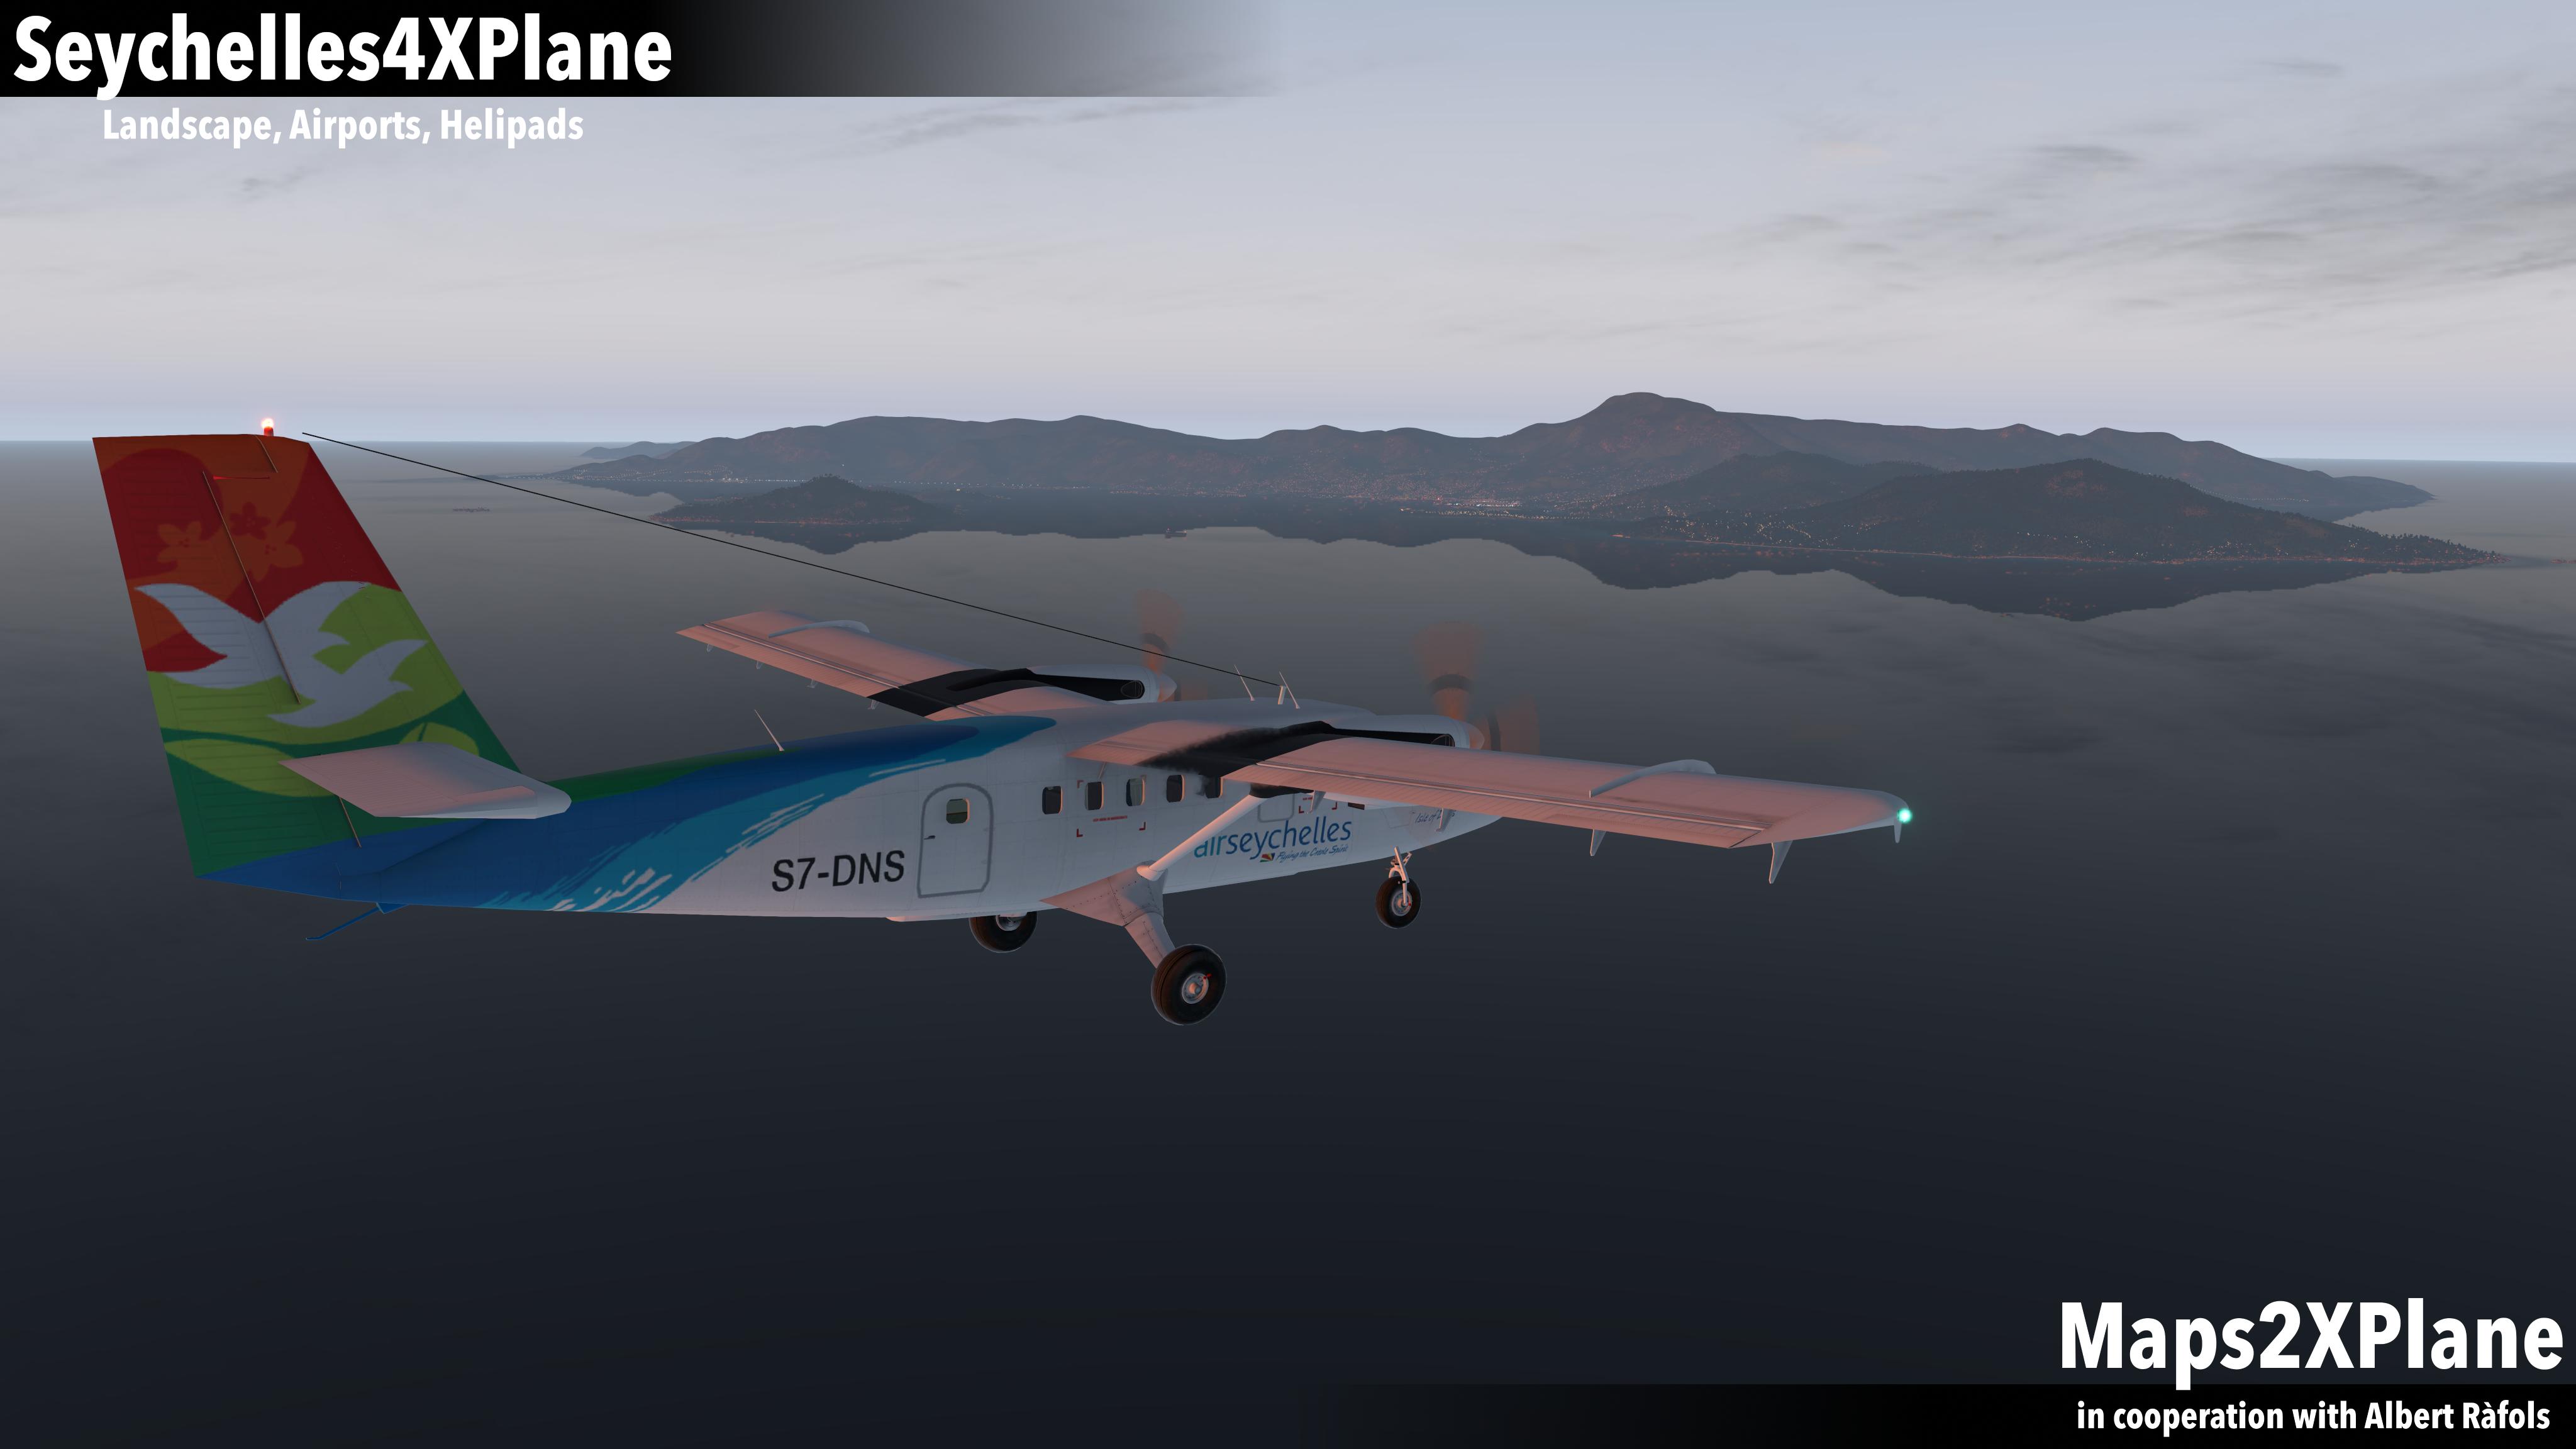 seychelles4xplane_mesh_02.png